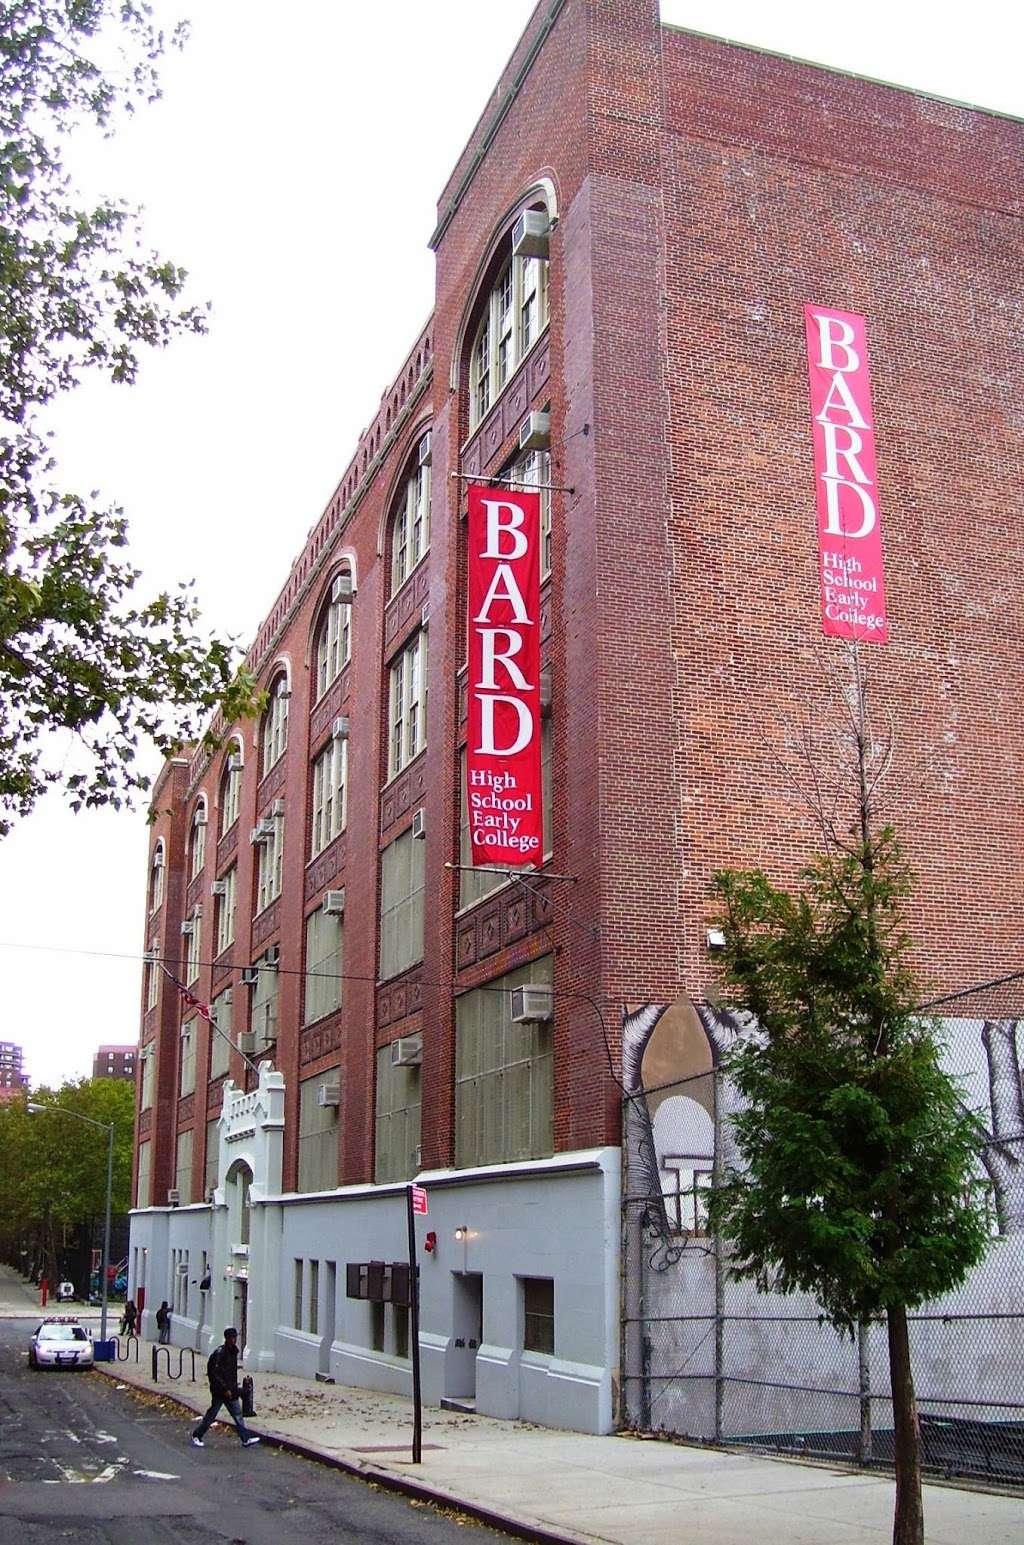 Bard High School Early College - school  | Photo 1 of 1 | Address: 525 E Houston St, New York, NY 10002, USA | Phone: (212) 995-8479